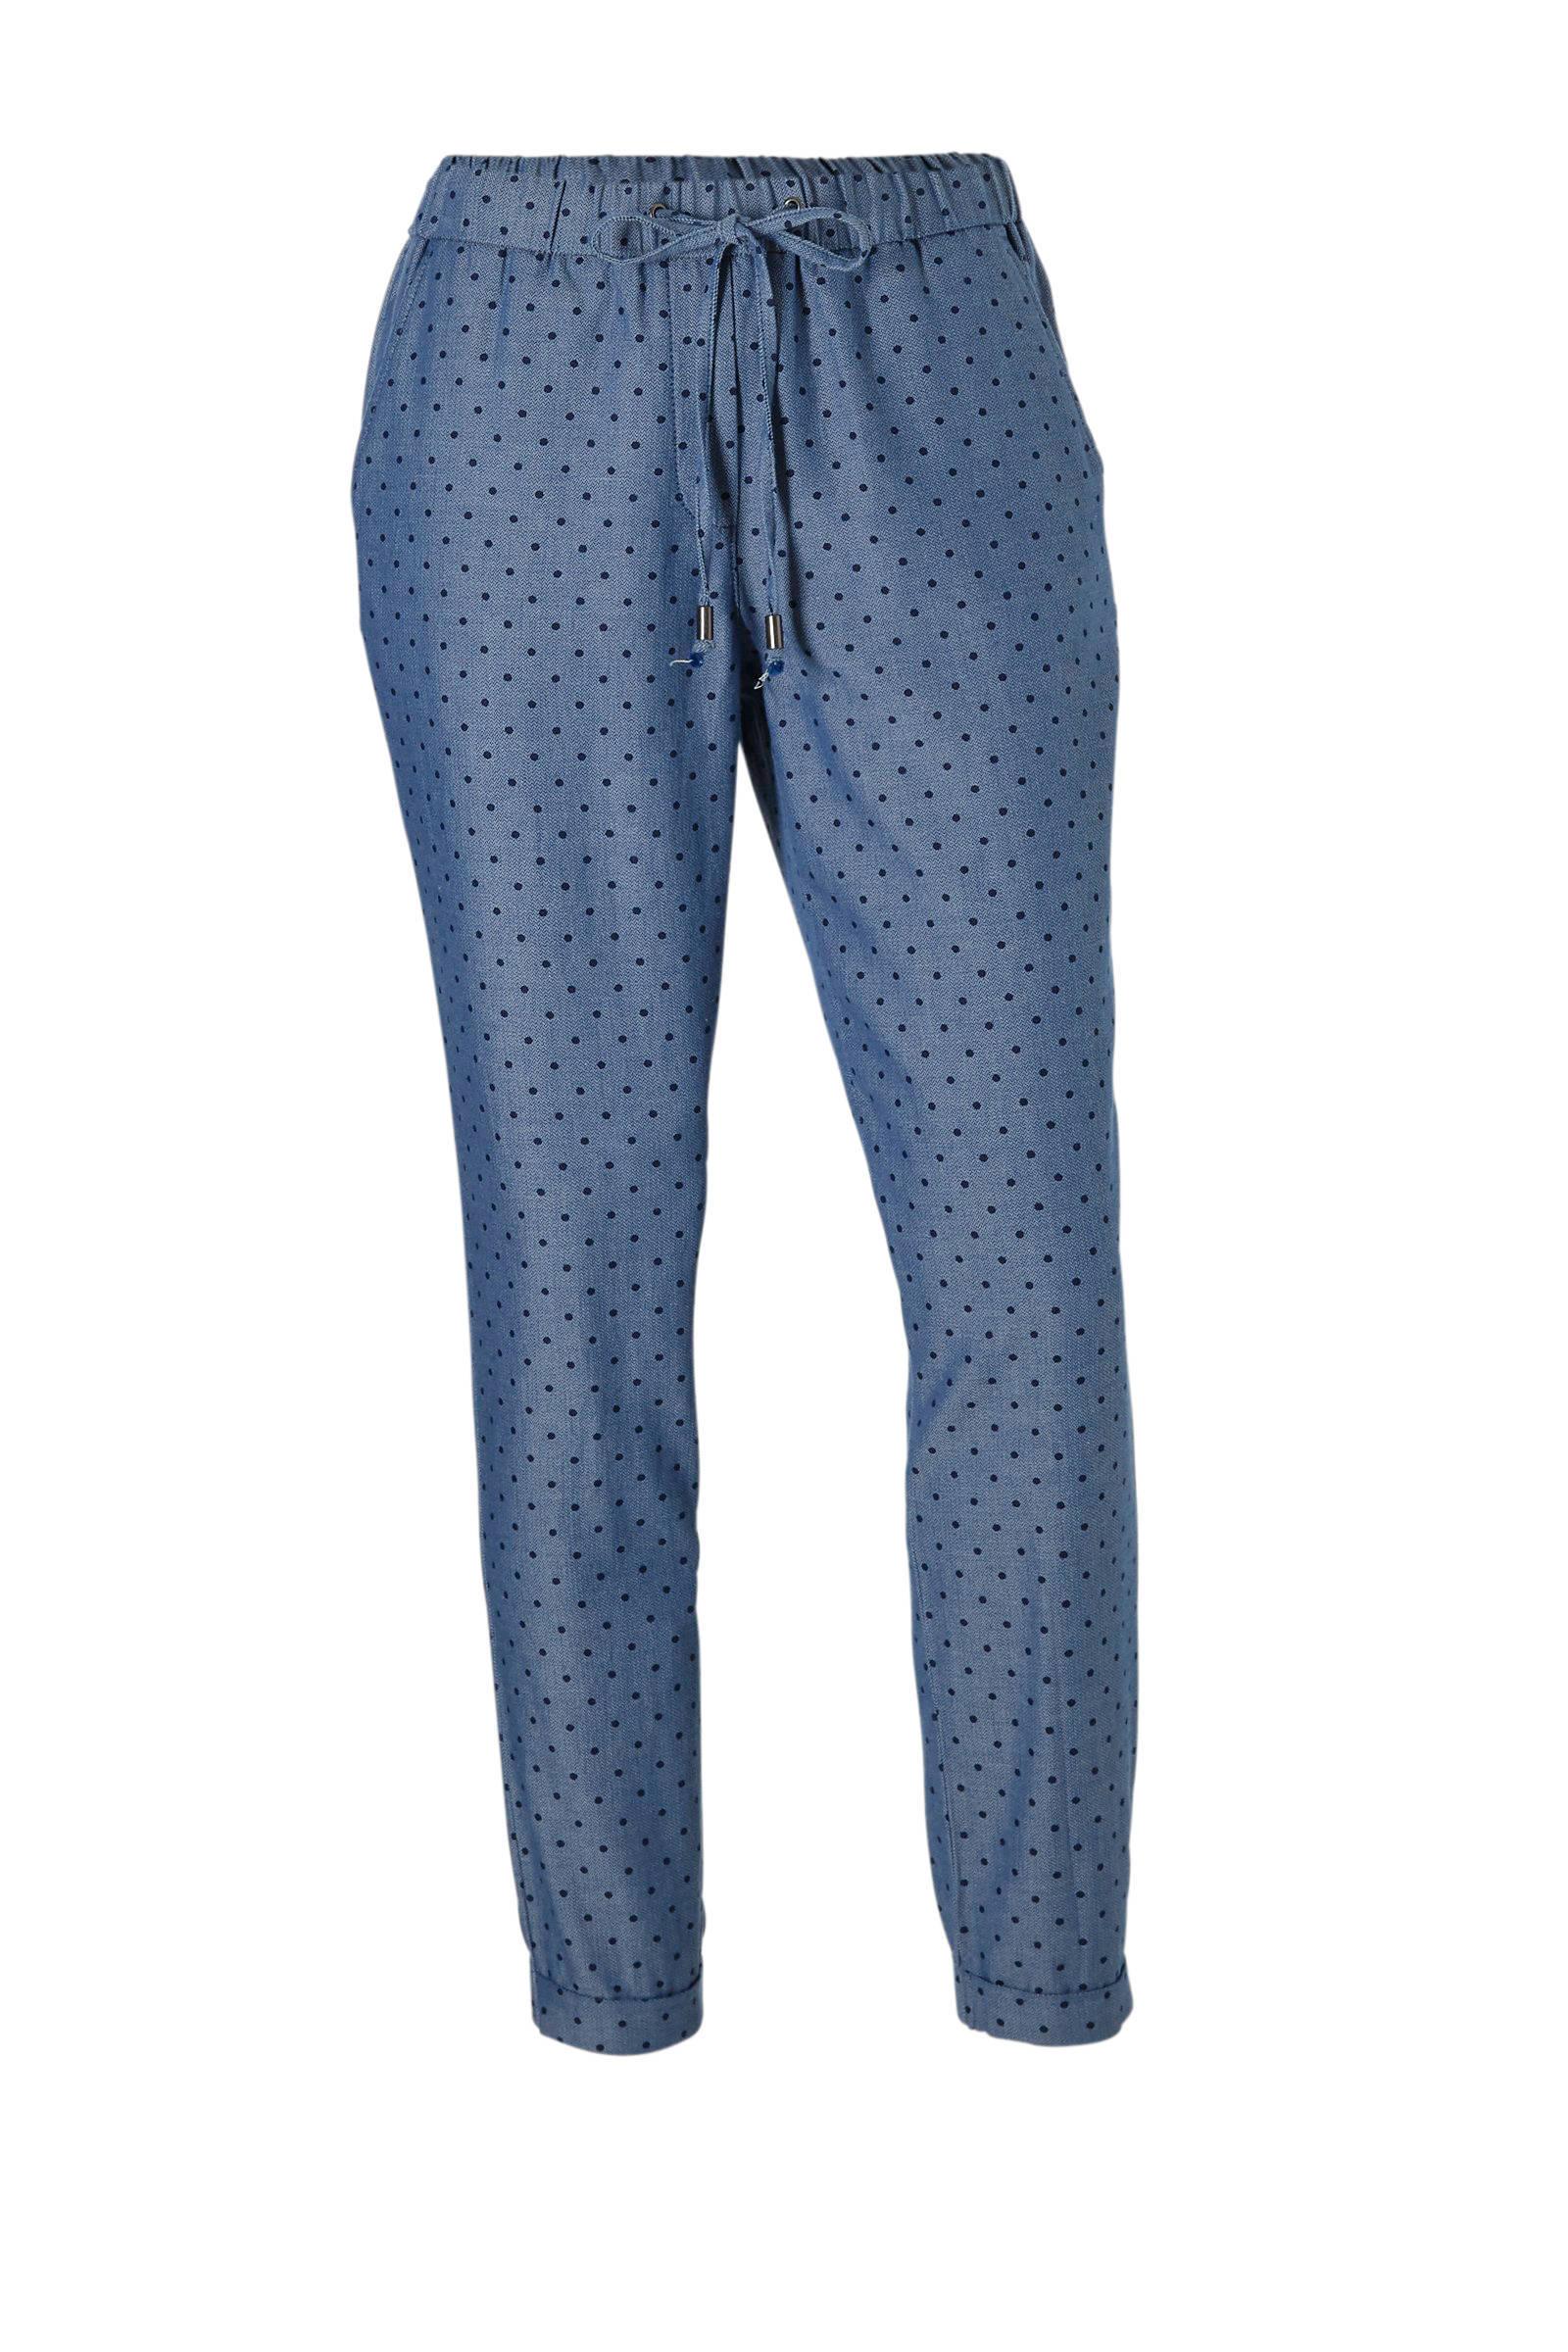 blauwe pantalon dames